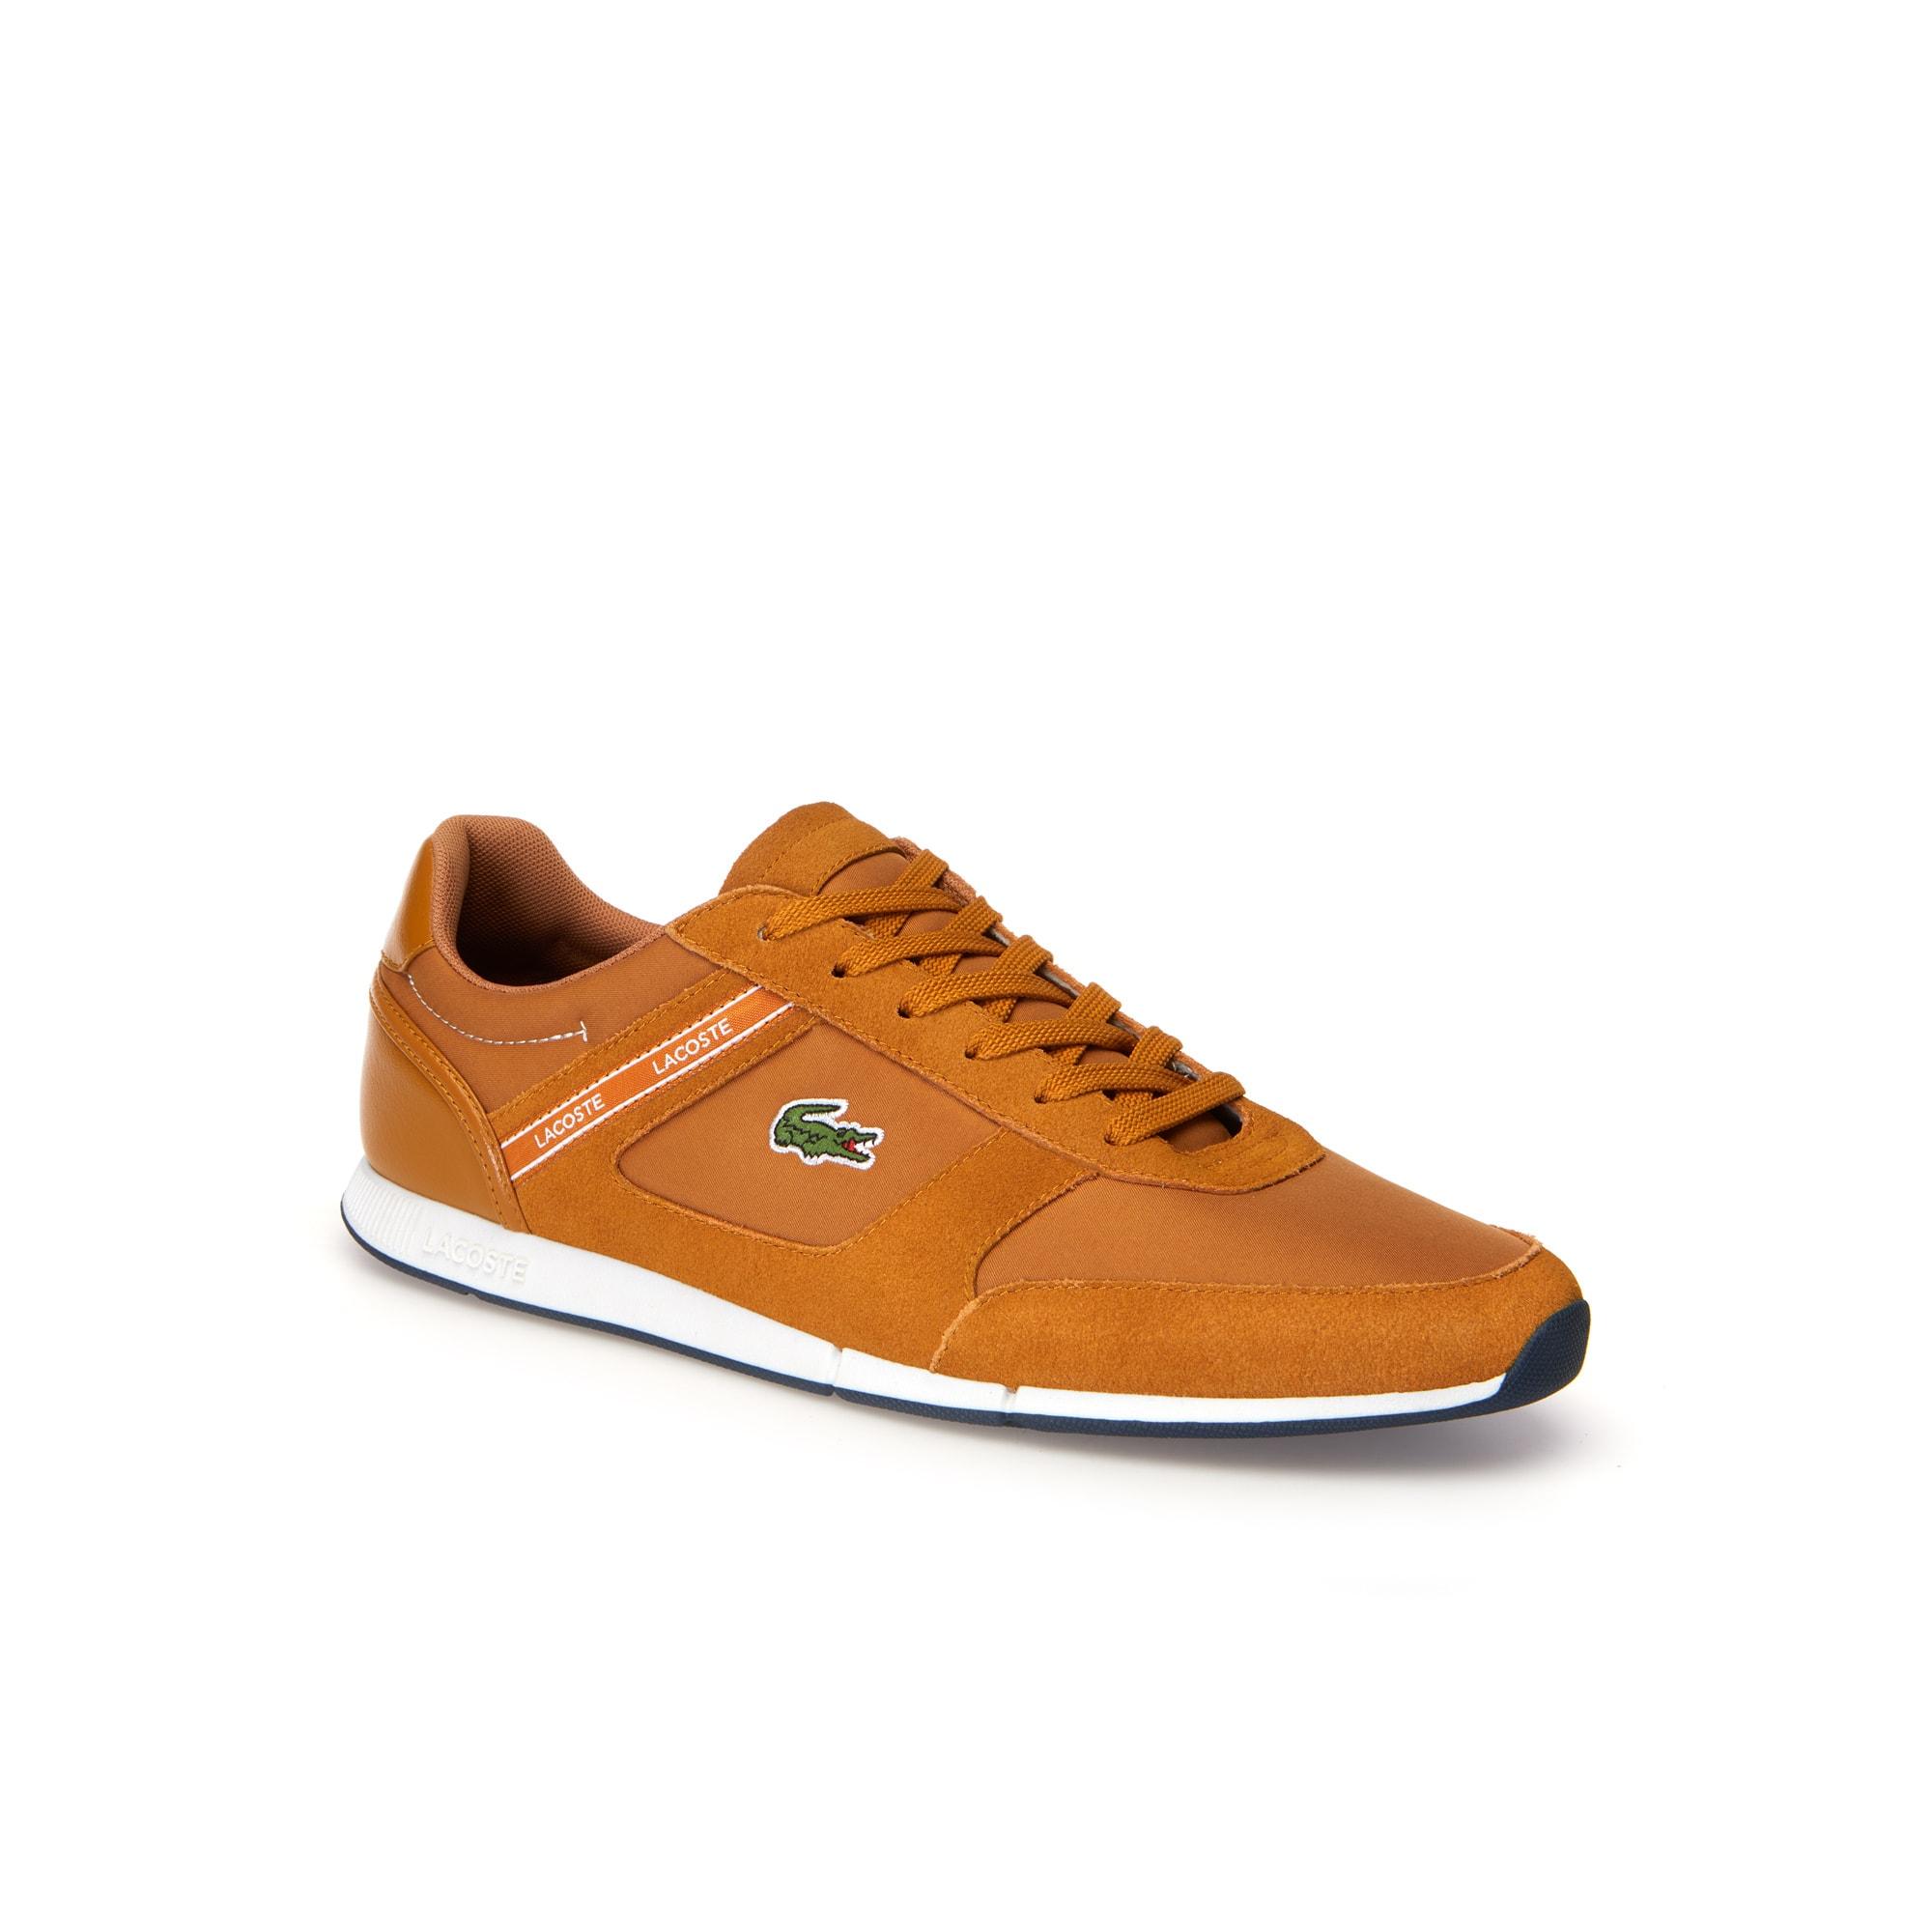 Herren-Sneakers MENERVA aus Veloursleder LACOSTE SPORT